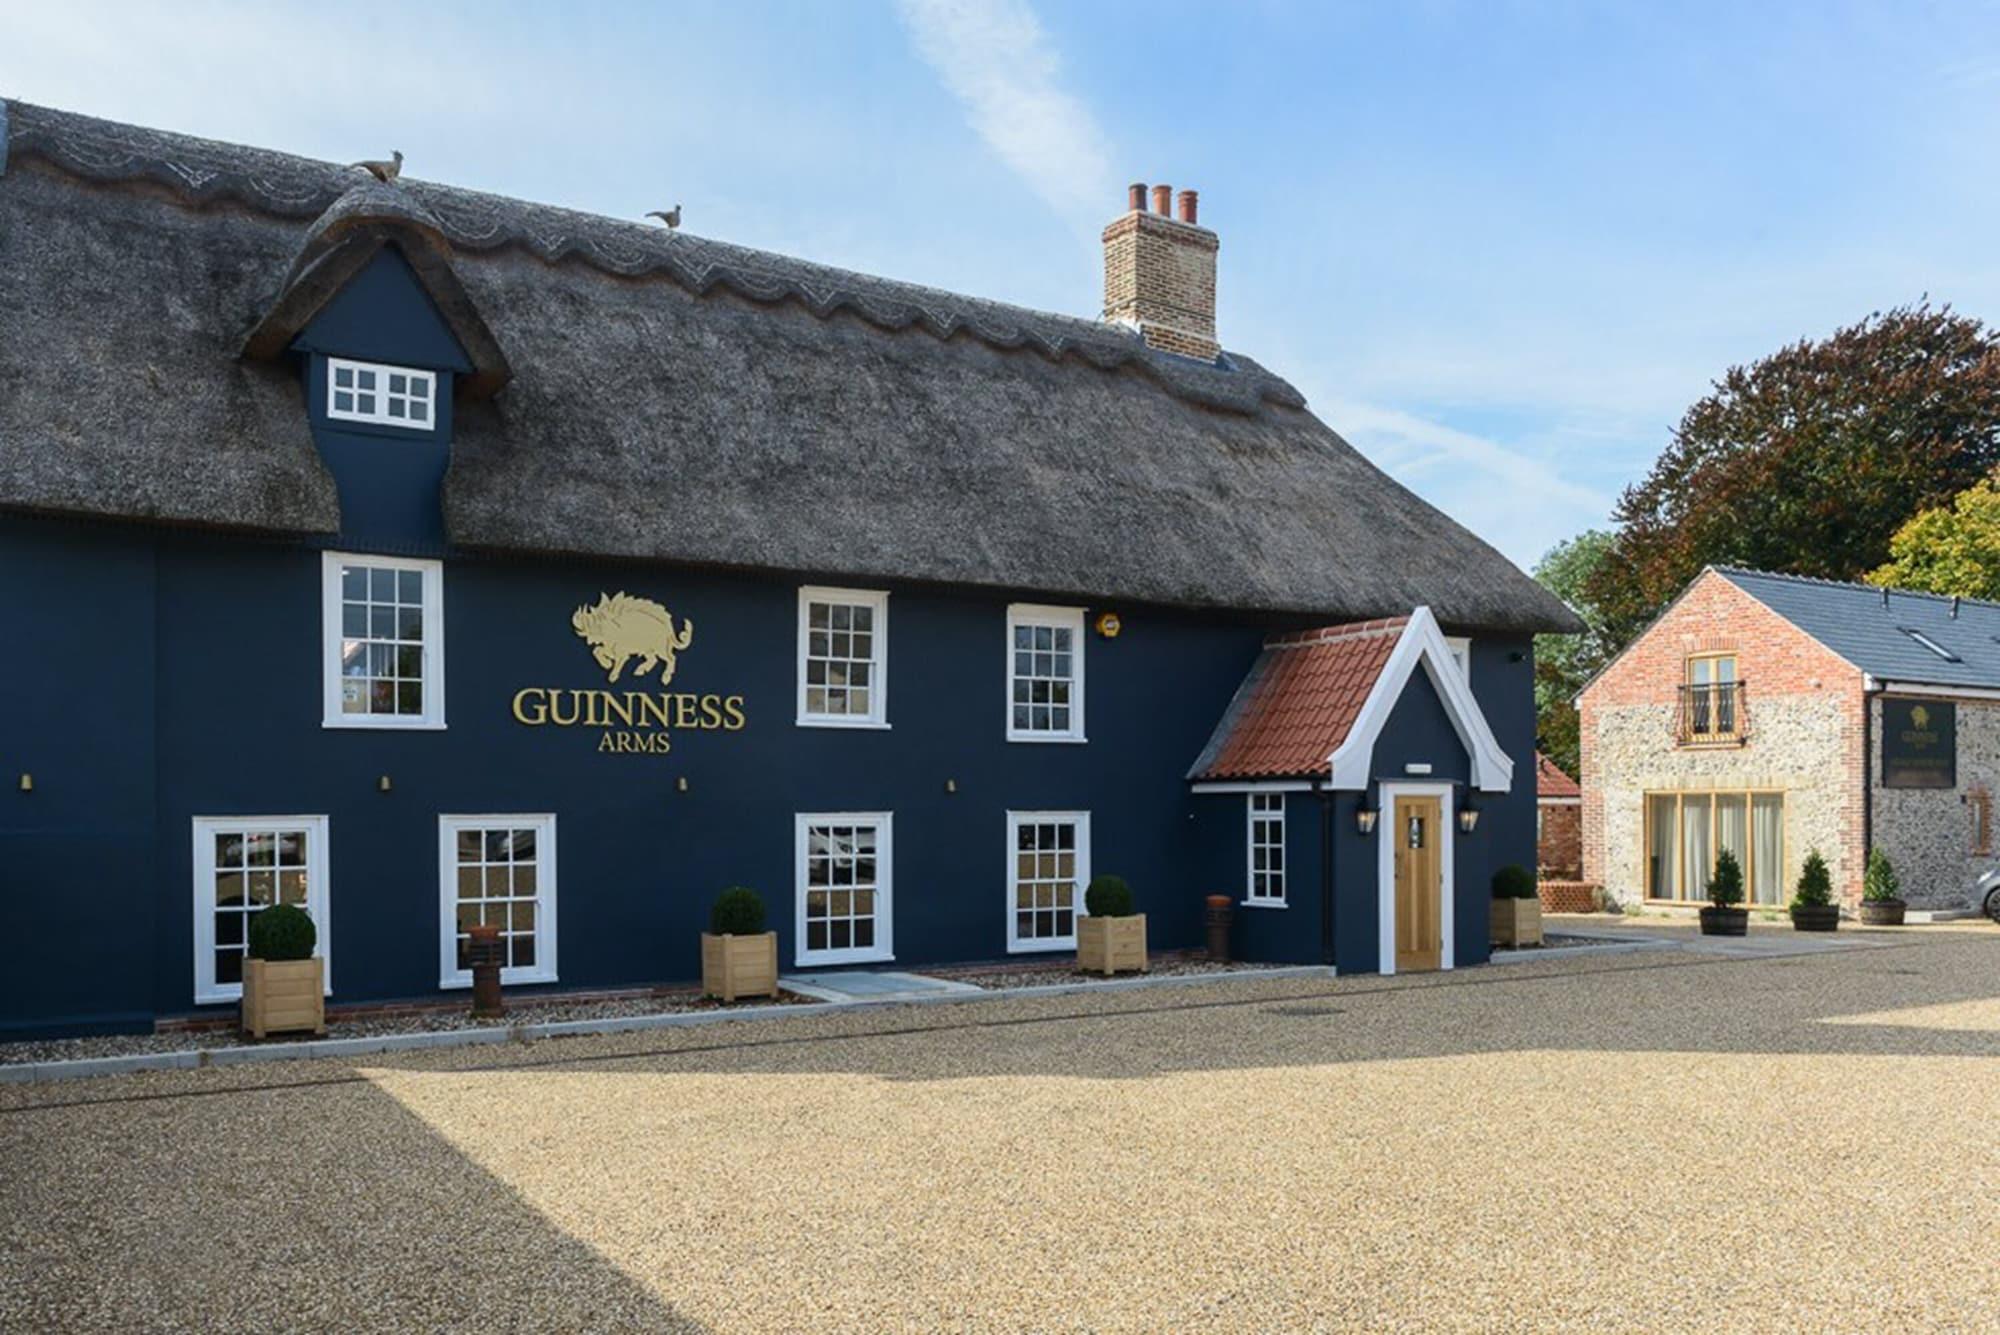 Guinness Arms, Suffolk